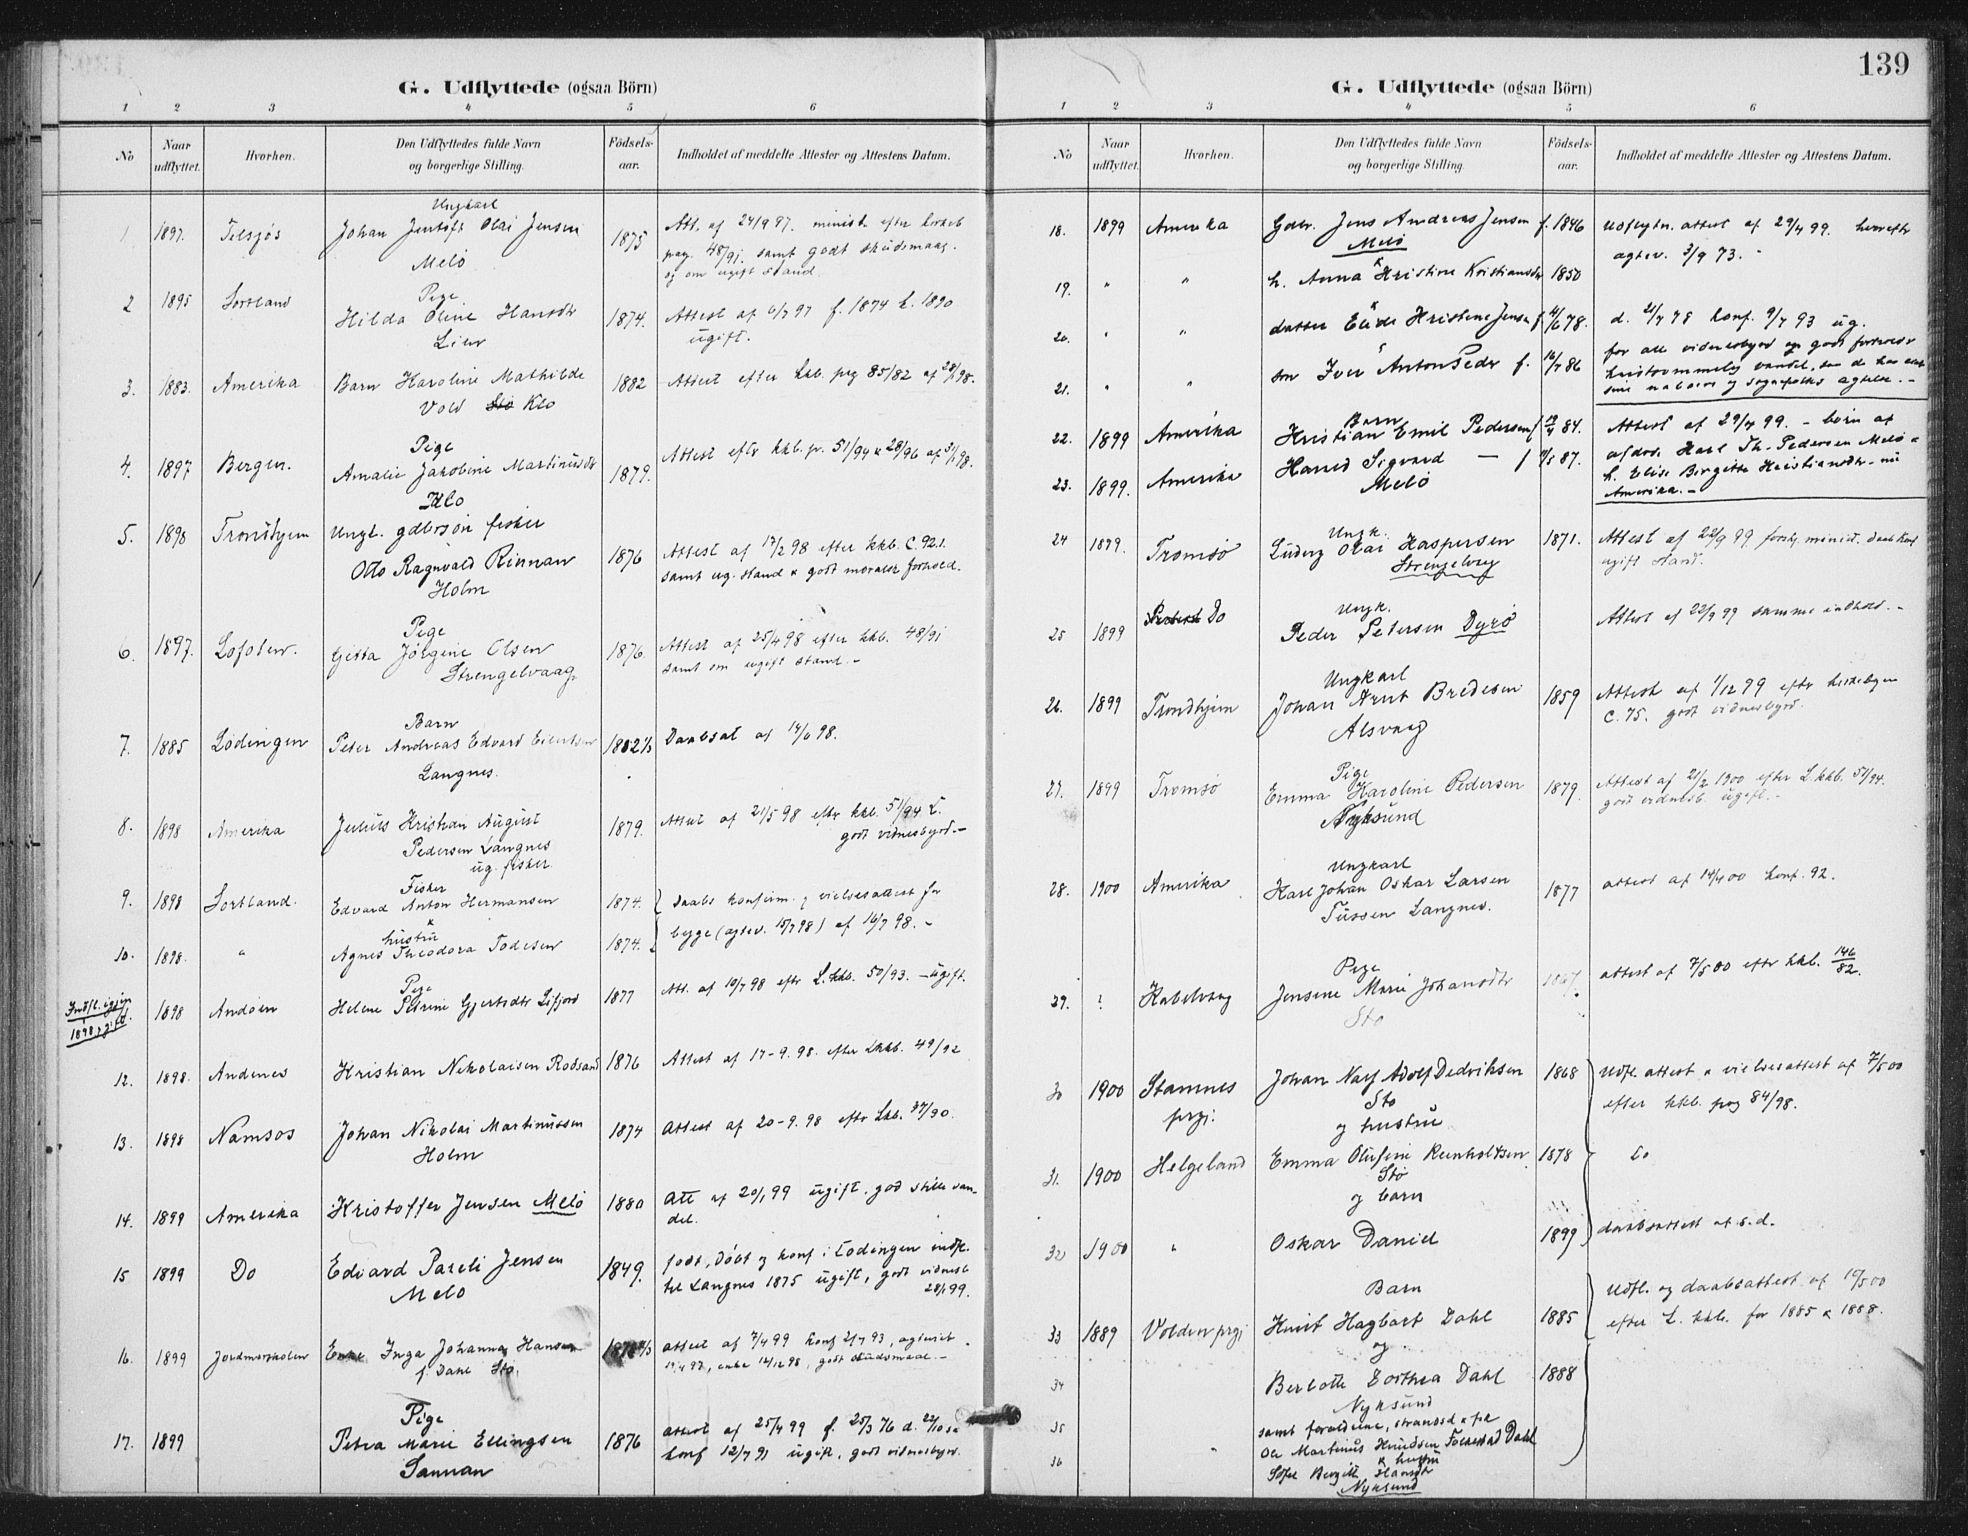 SAT, Ministerialprotokoller, klokkerbøker og fødselsregistre - Nordland, 894/L1356: Ministerialbok nr. 894A02, 1897-1914, s. 139